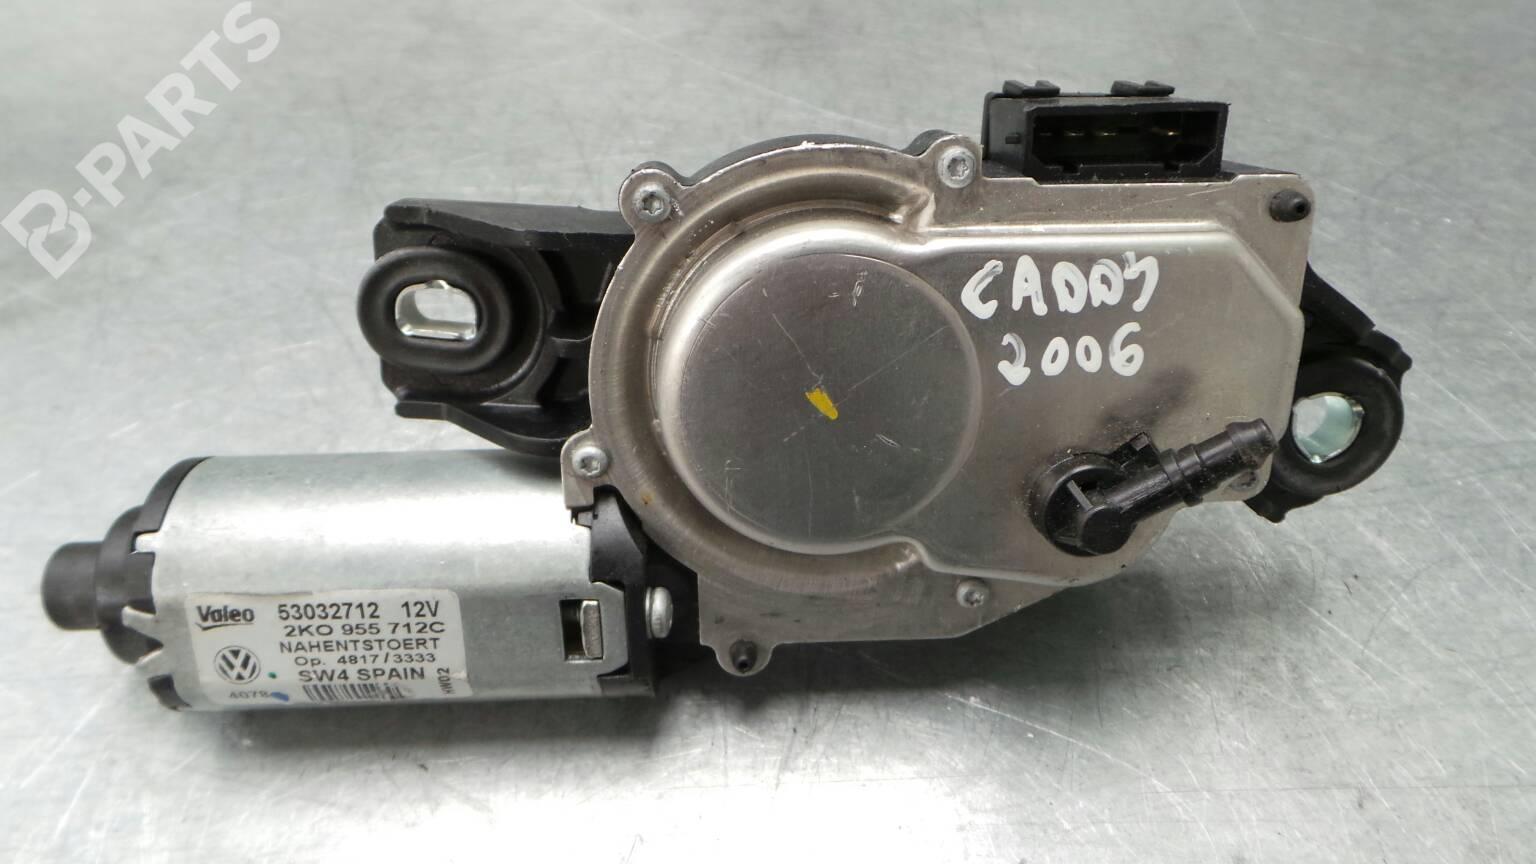 Front Wiper Motor Vw Caddy Iii Estate 2kb 2kj 2cb 2cj 202988 Fuse Box 2012 53032712 2k0955712c